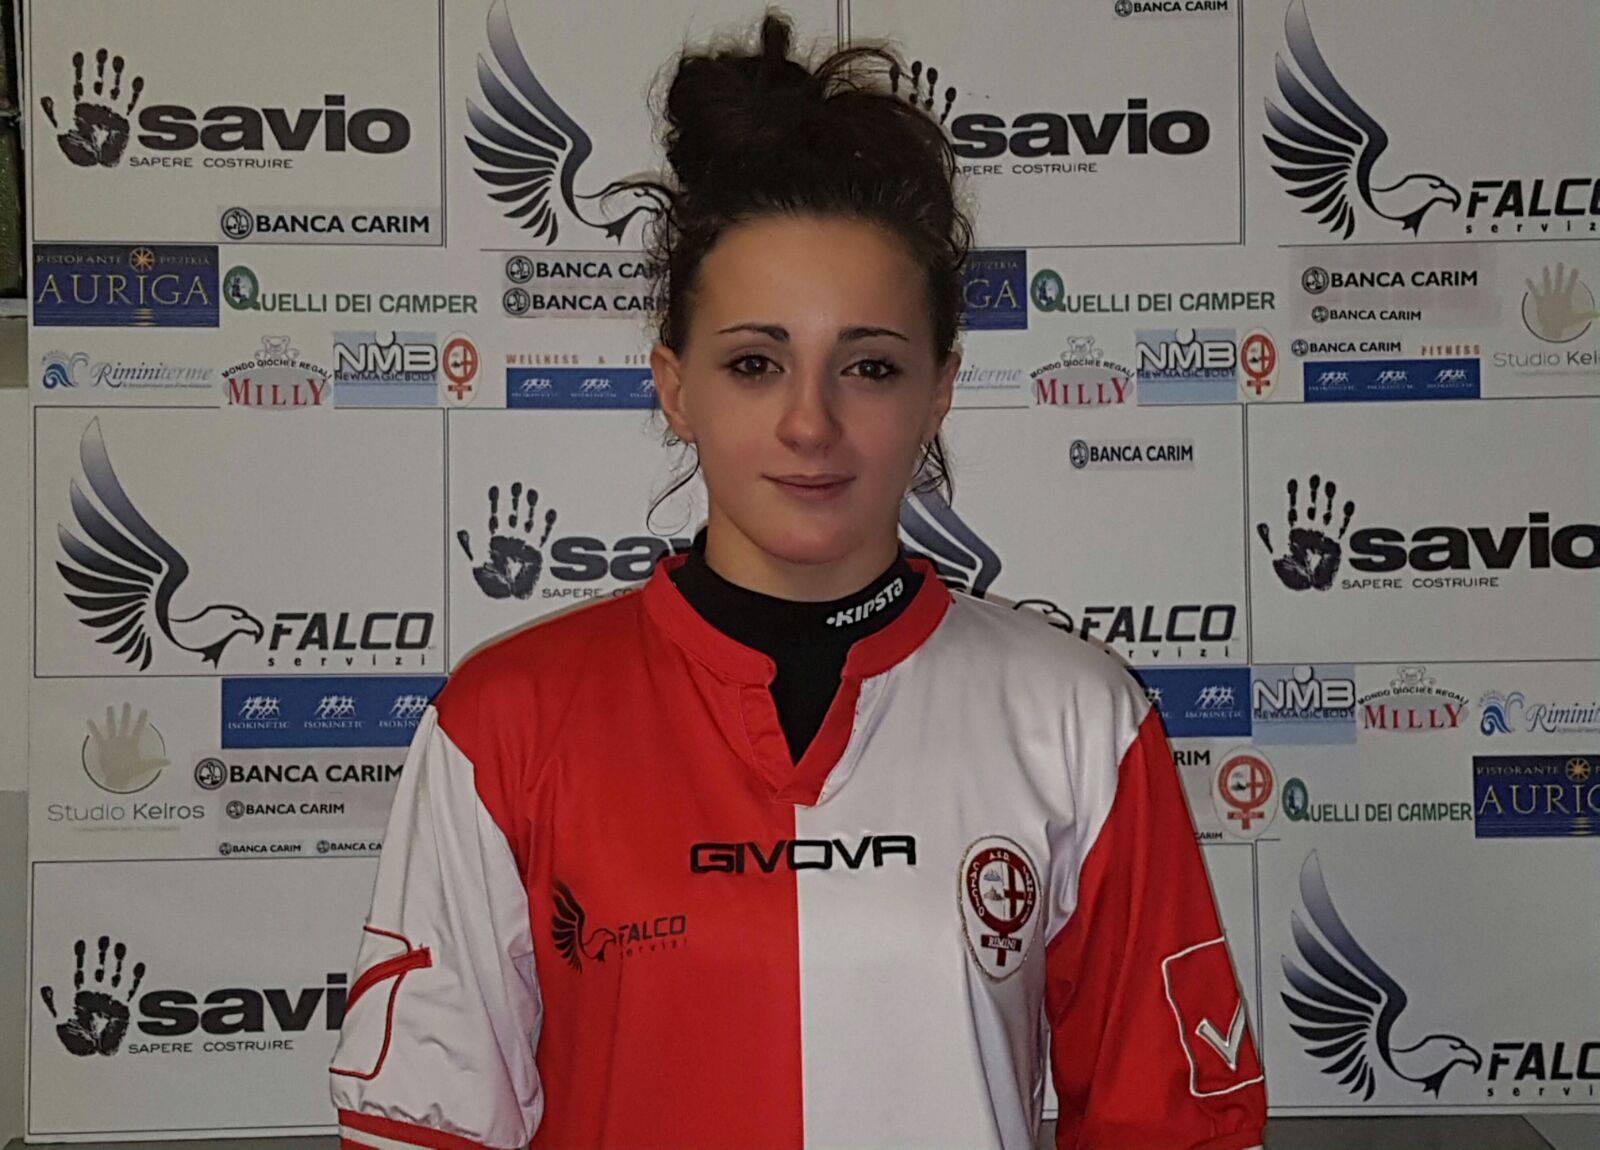 Silvia Calandrini